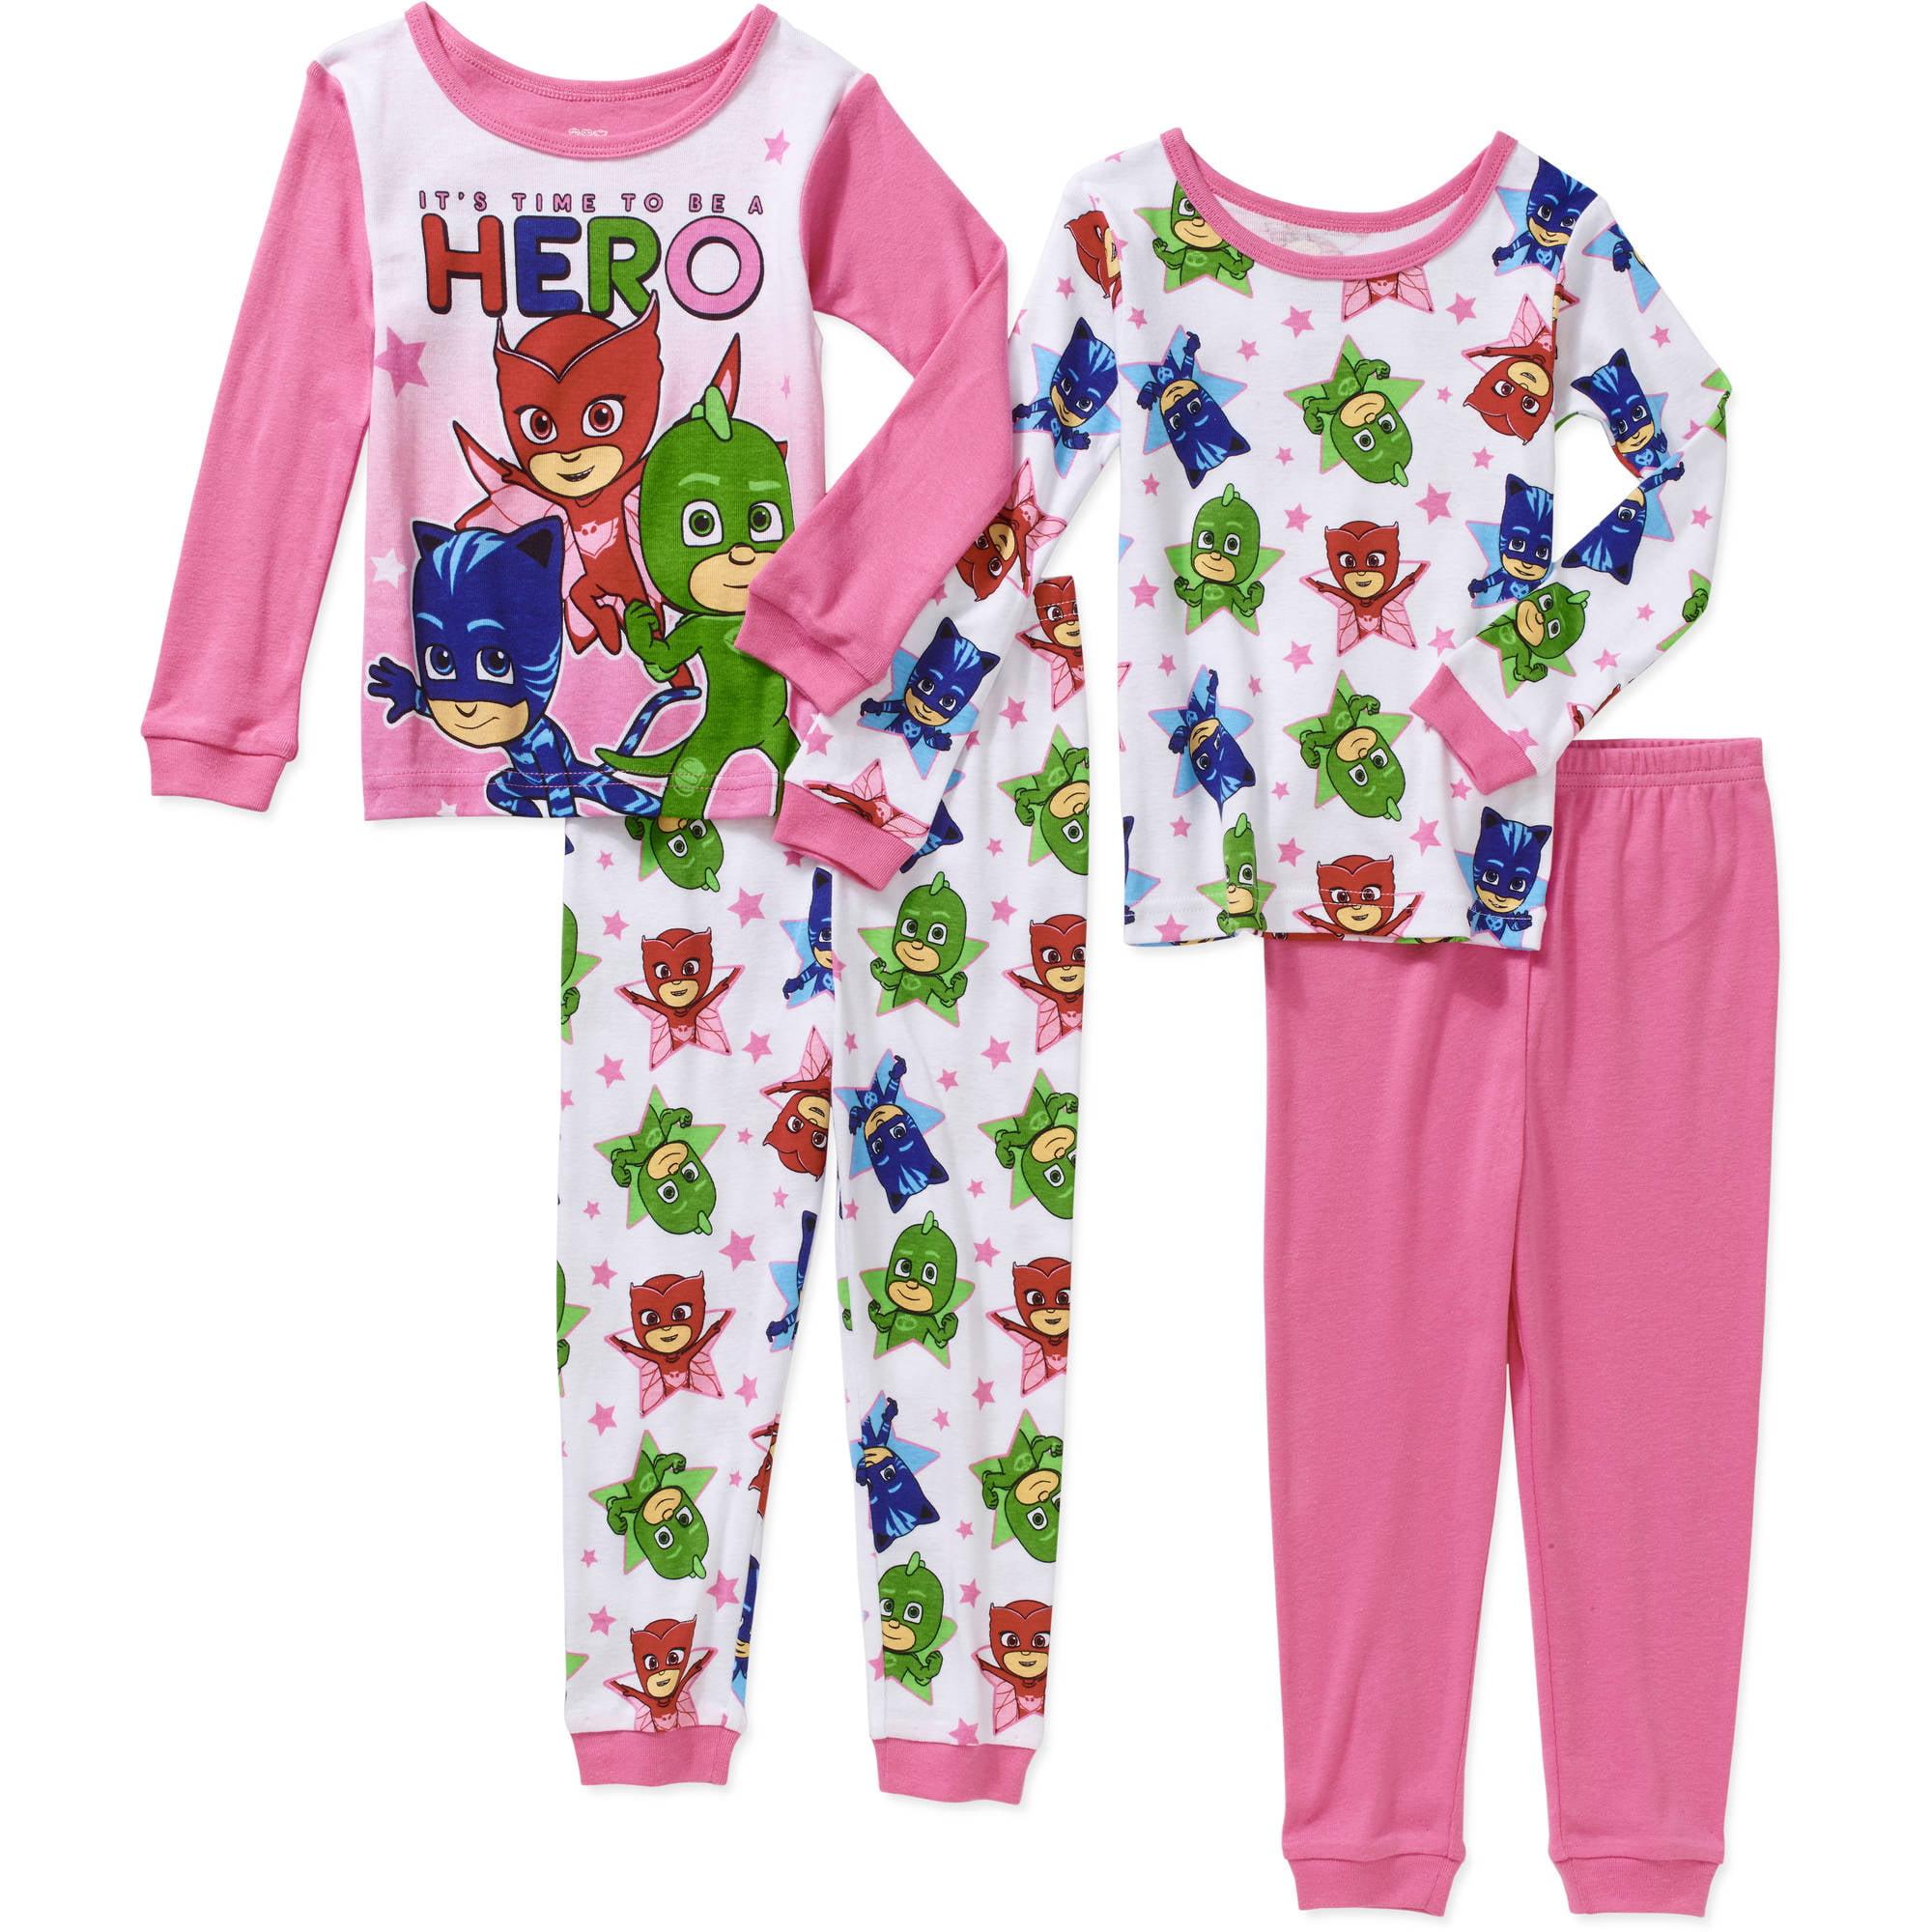 PJ Masks Toddler Girl Cotton Tight Fit Pajamas 4pc Set - Walmart.com